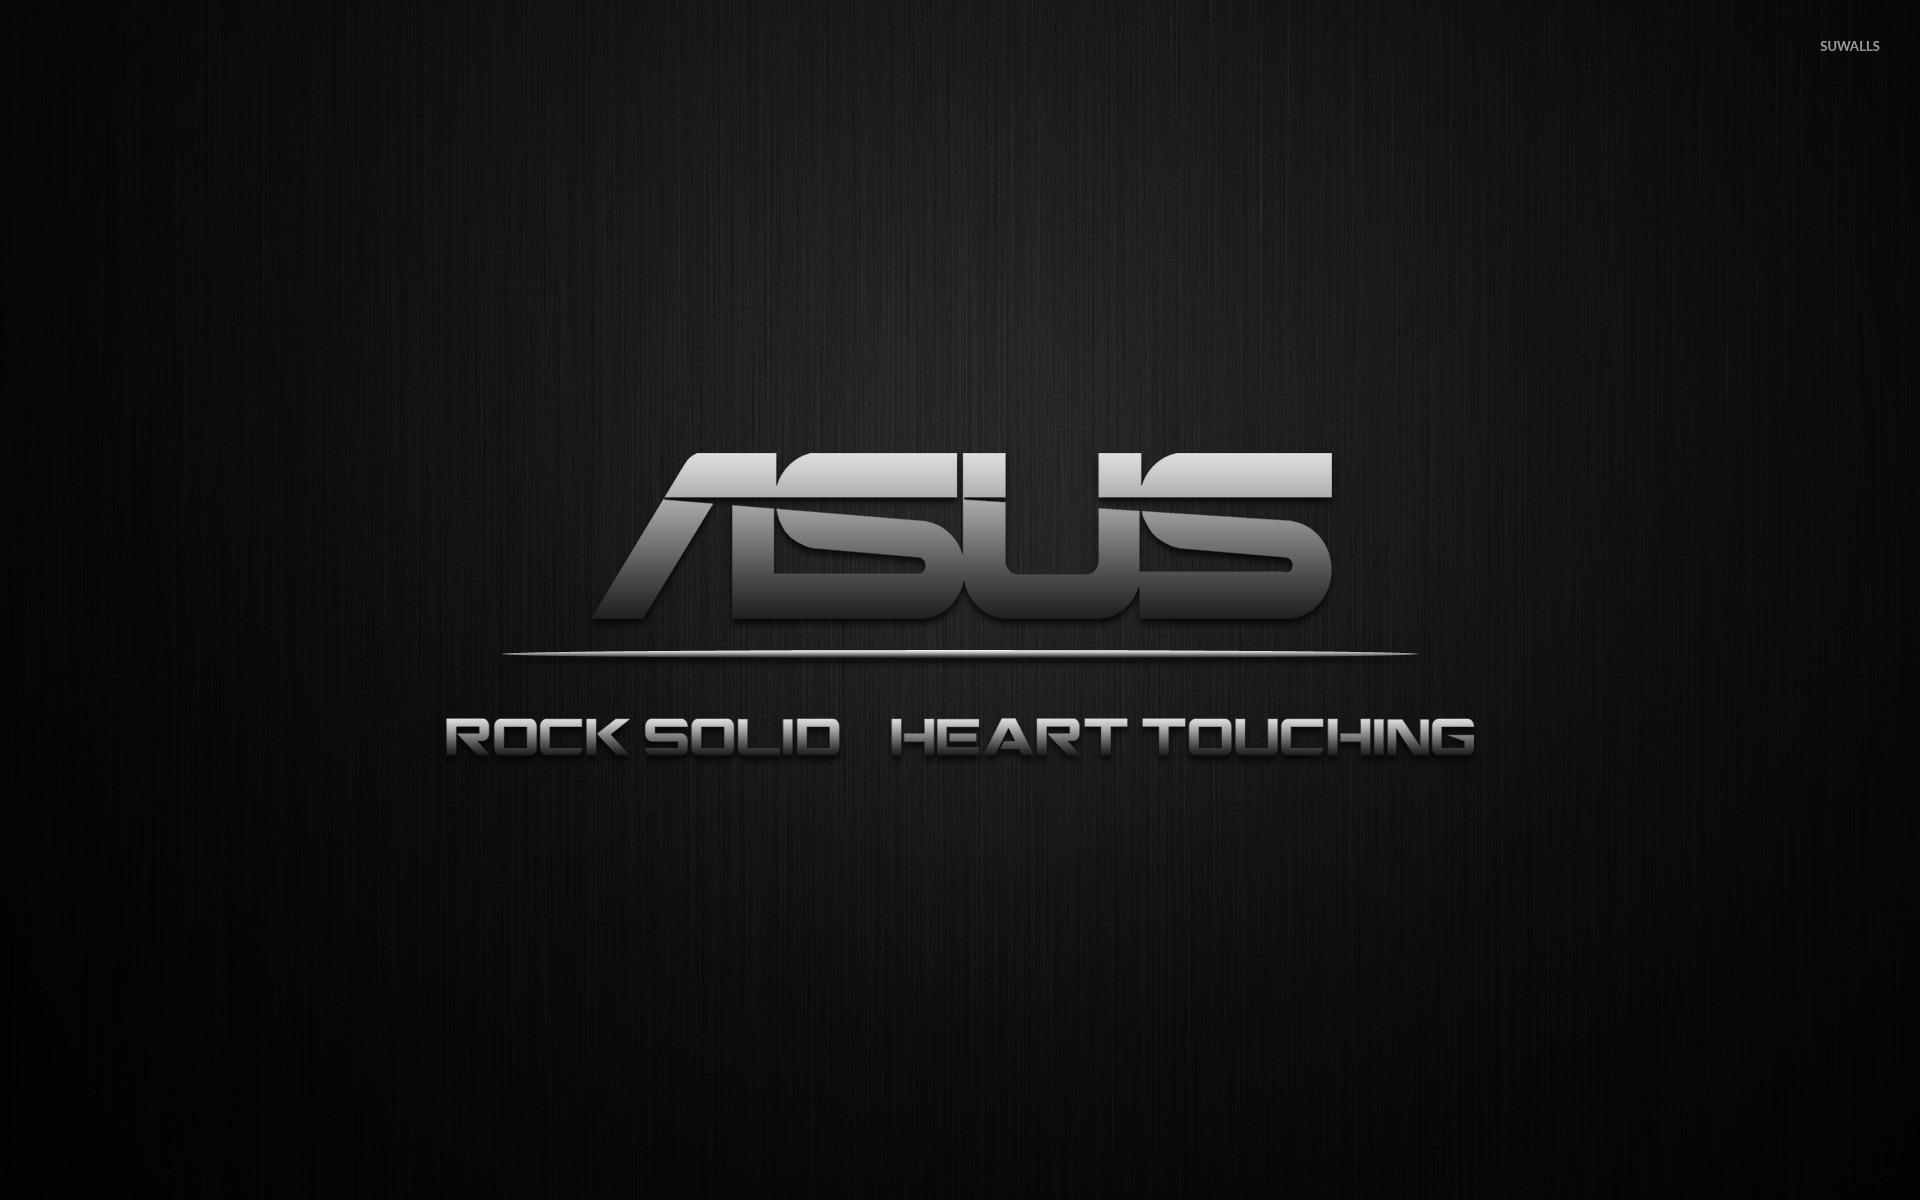 Asus [3] wallpaper - Computer